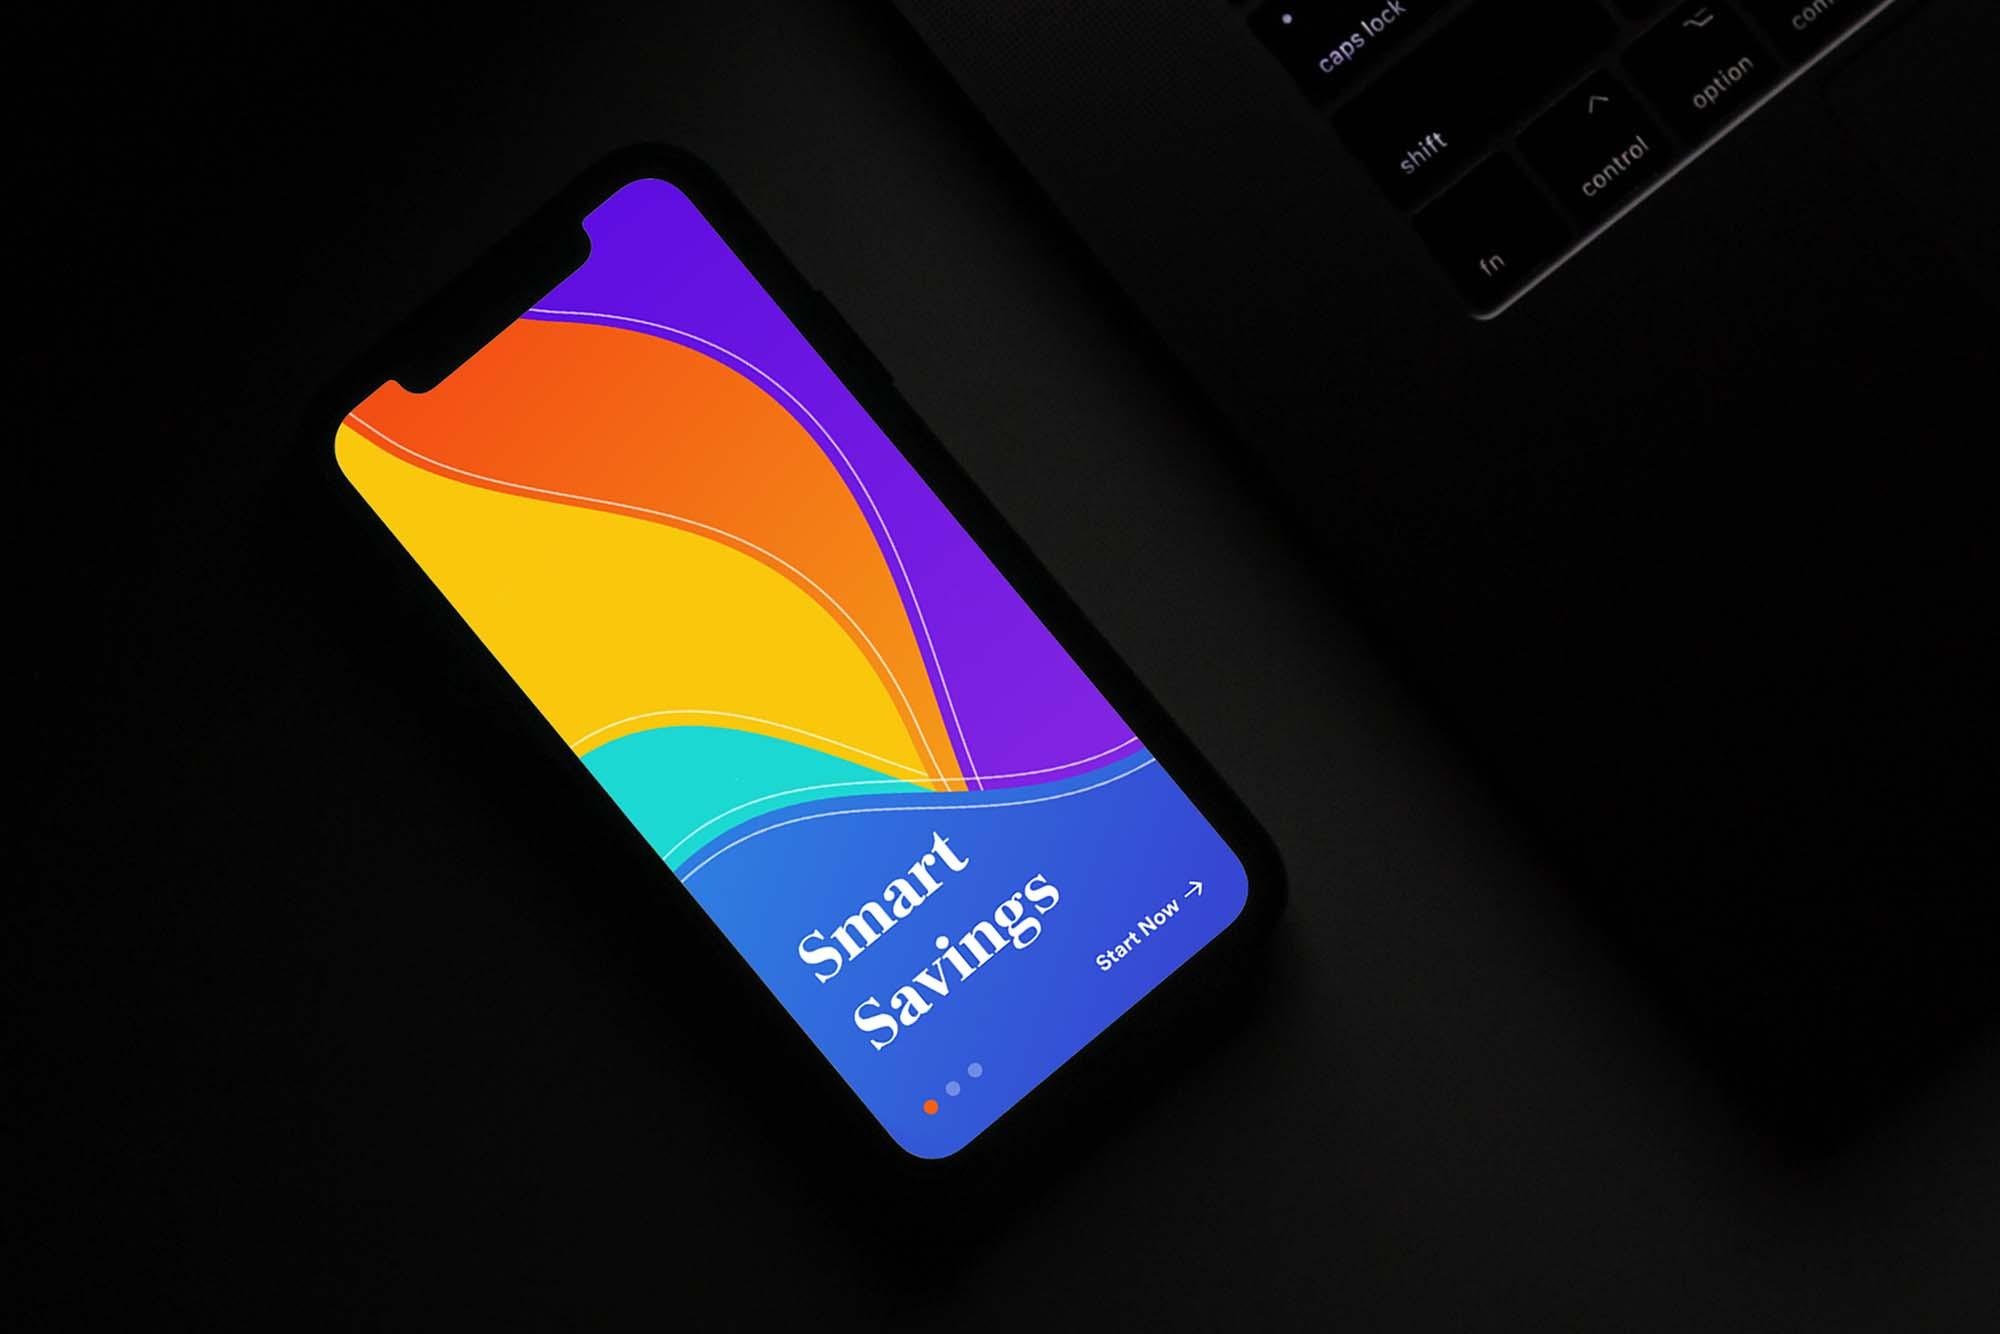 Bank App Concept Template 2